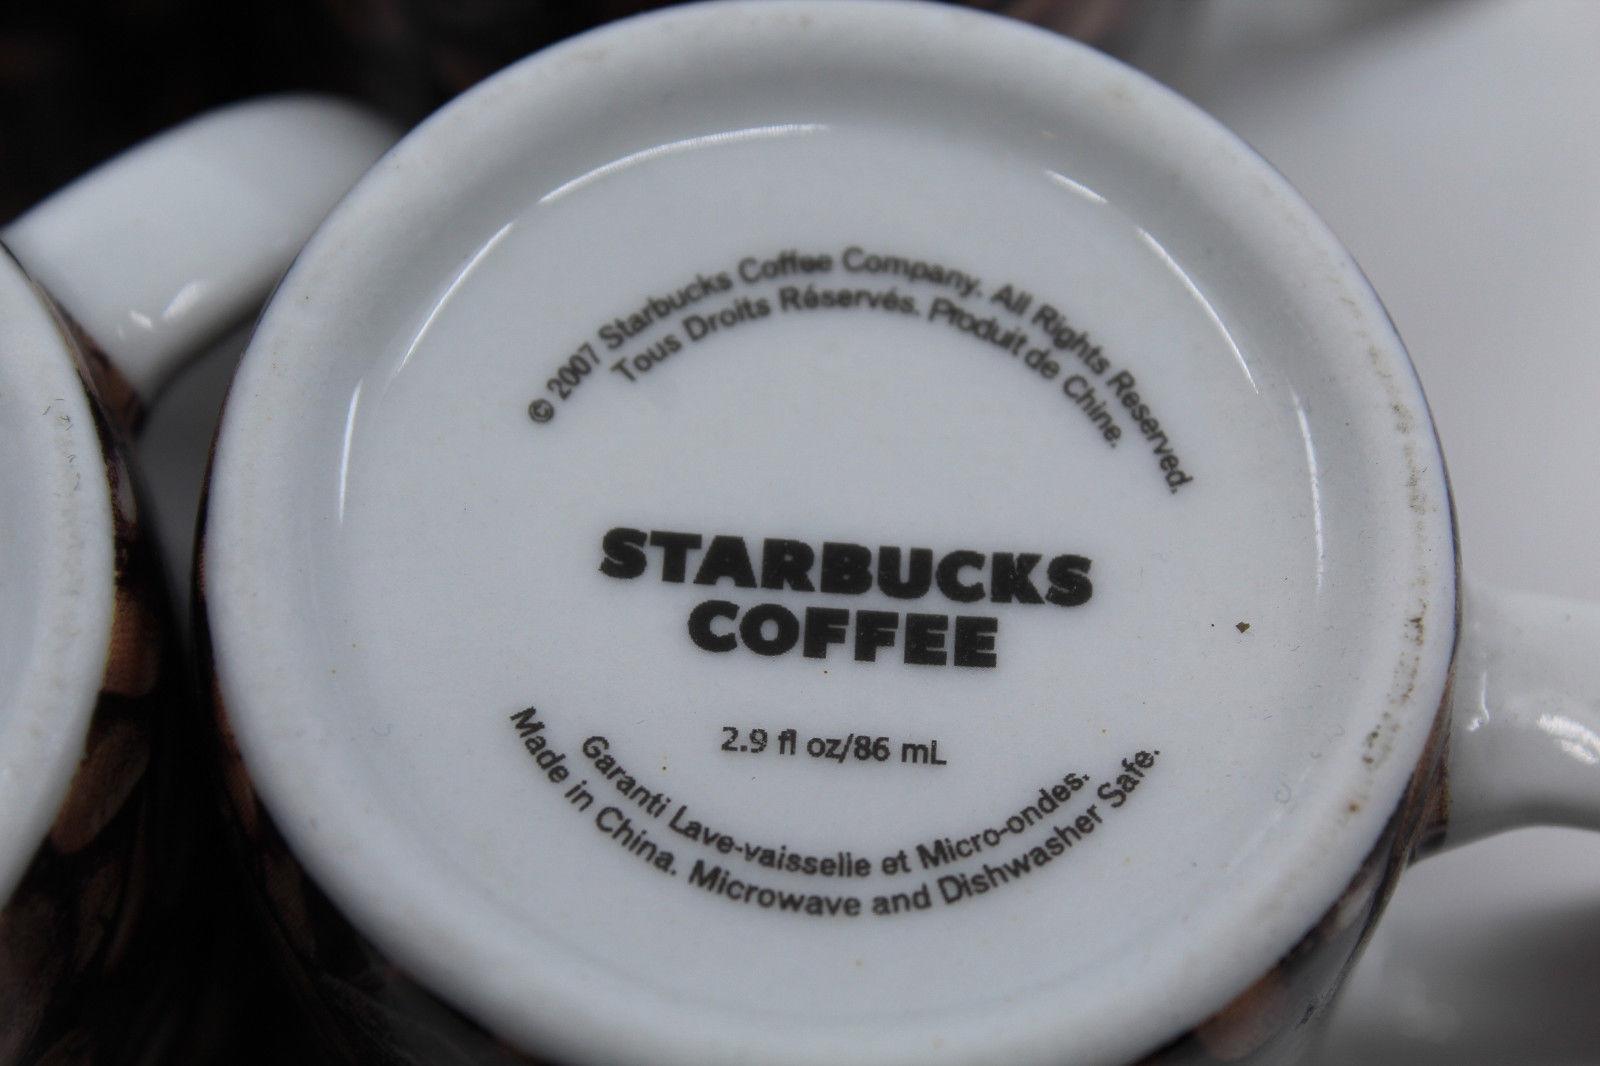 Starbucks Coffee 2007 Espresso Demitasse Mini Beans Mug Cup Set of 4 2.9oz 86ml